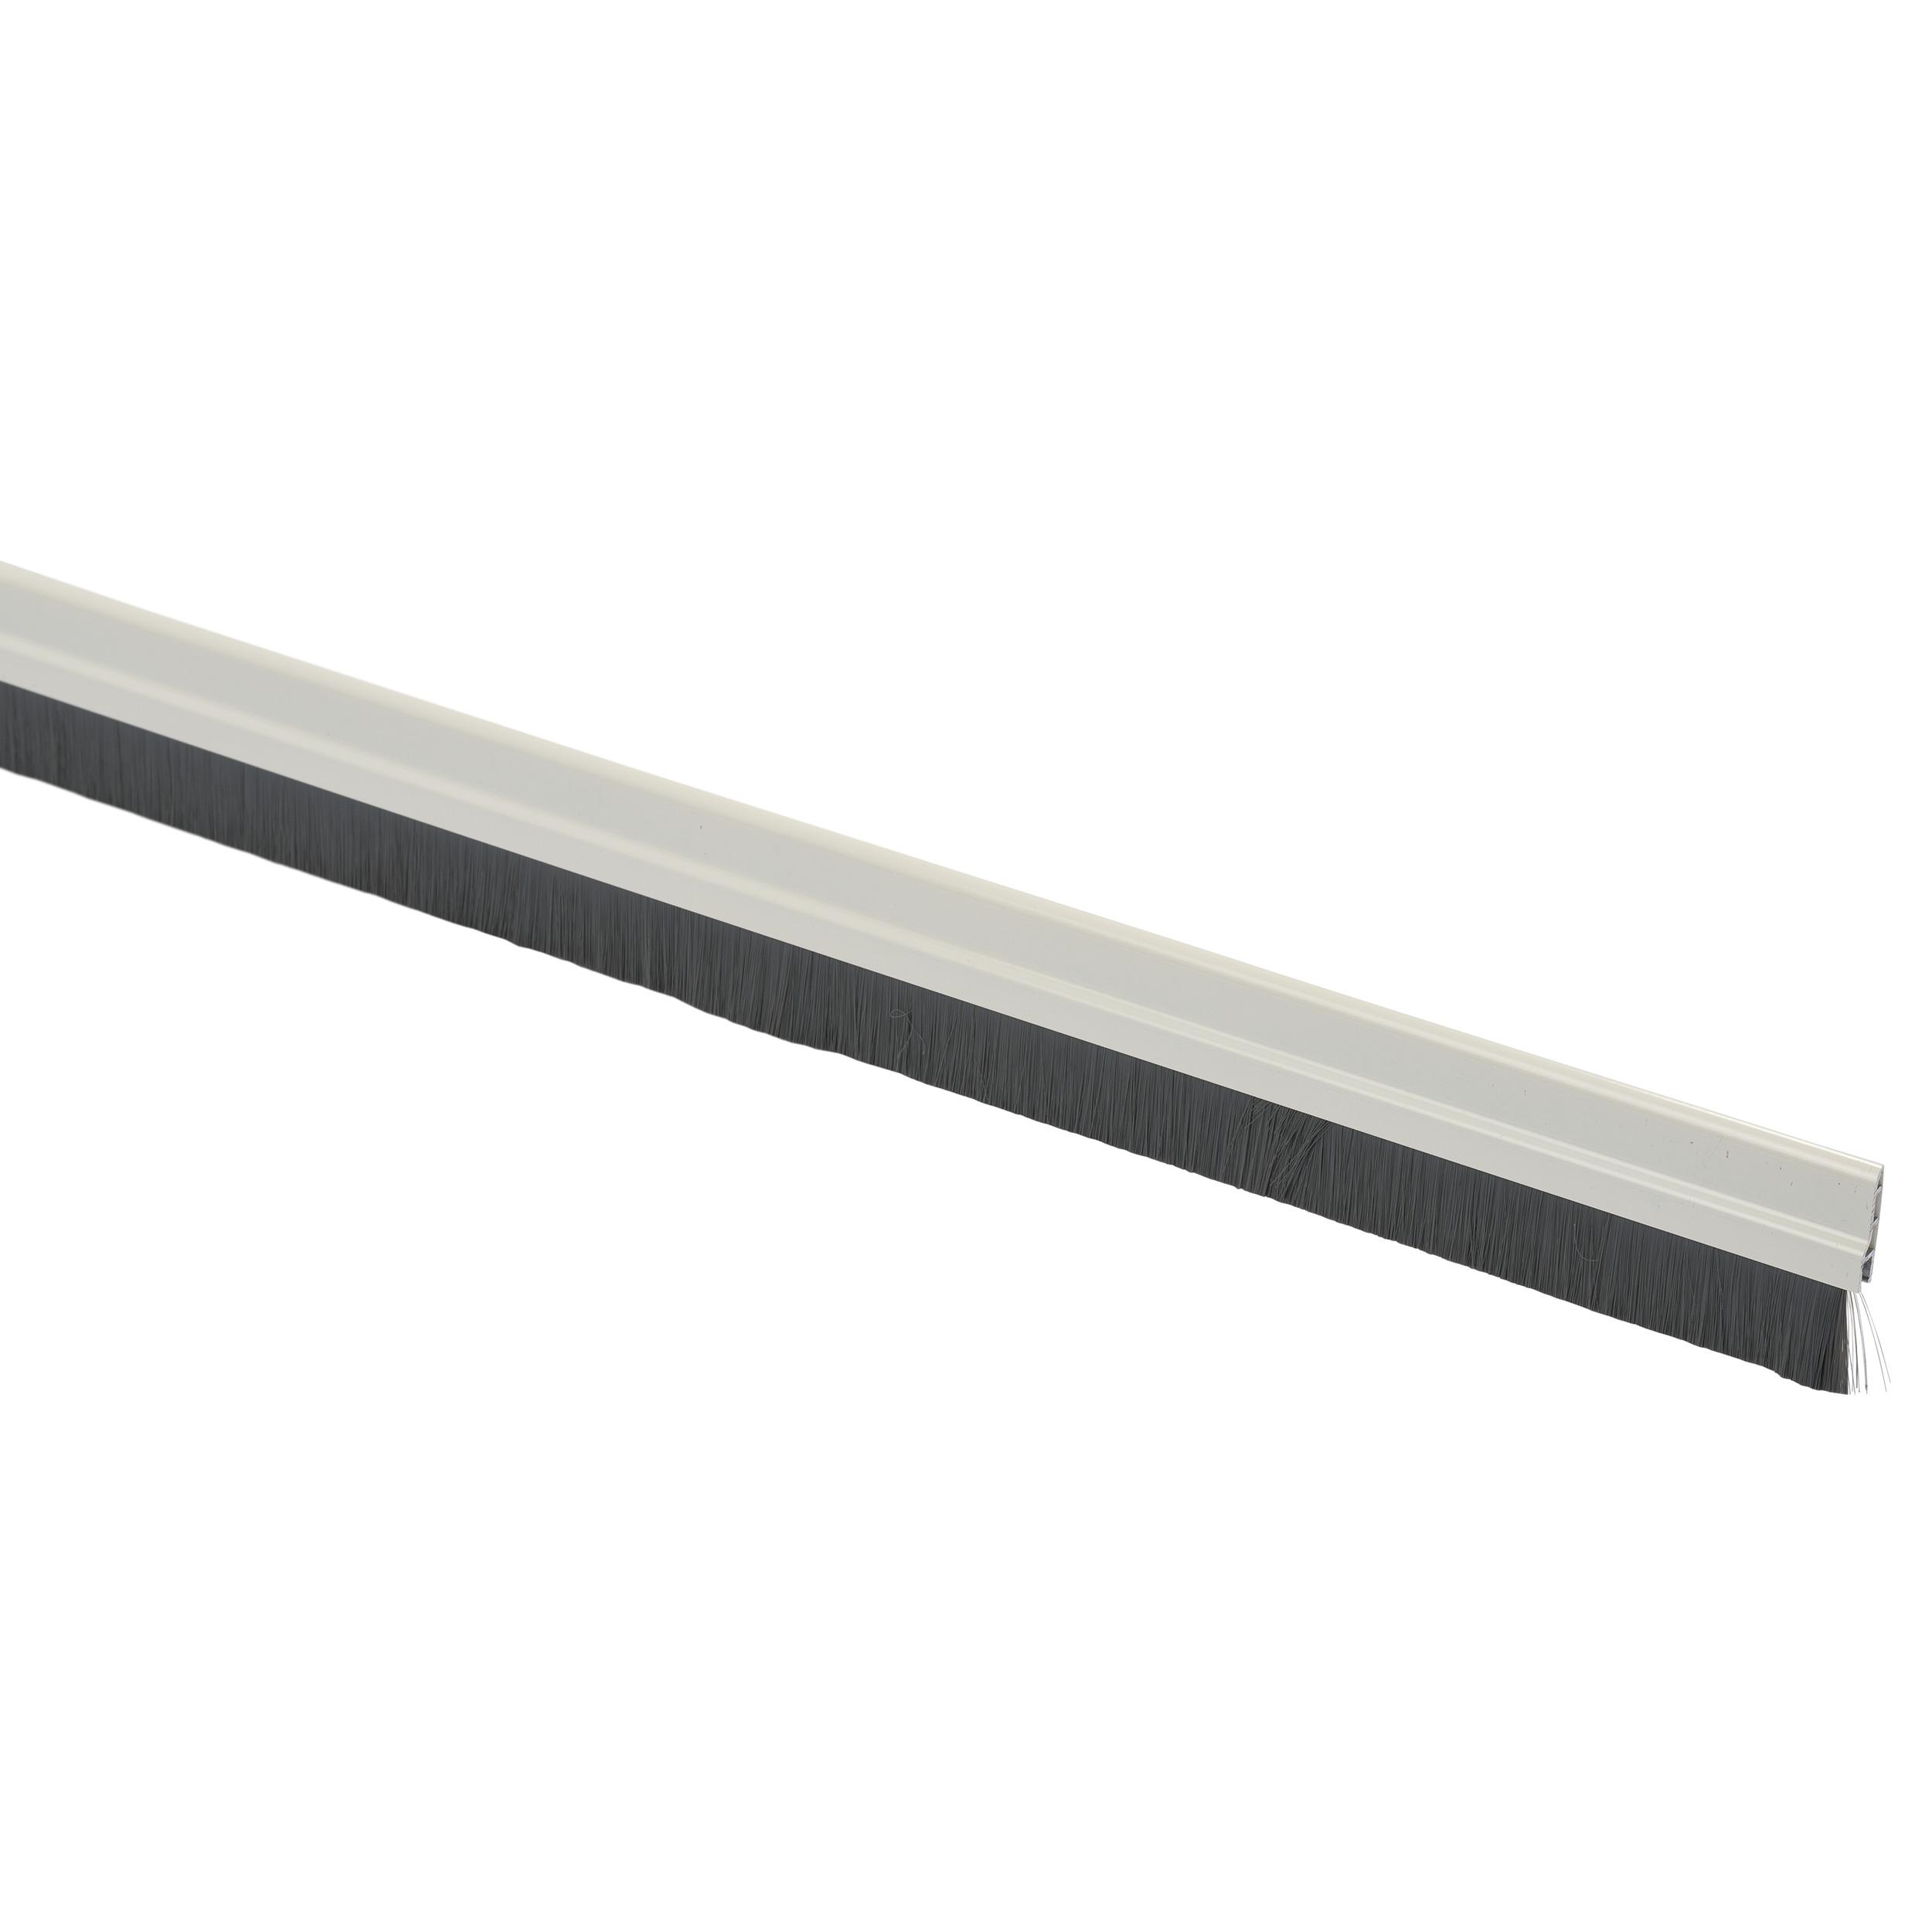 Handson tochtstrip aluminium 93 cm met borstel wit